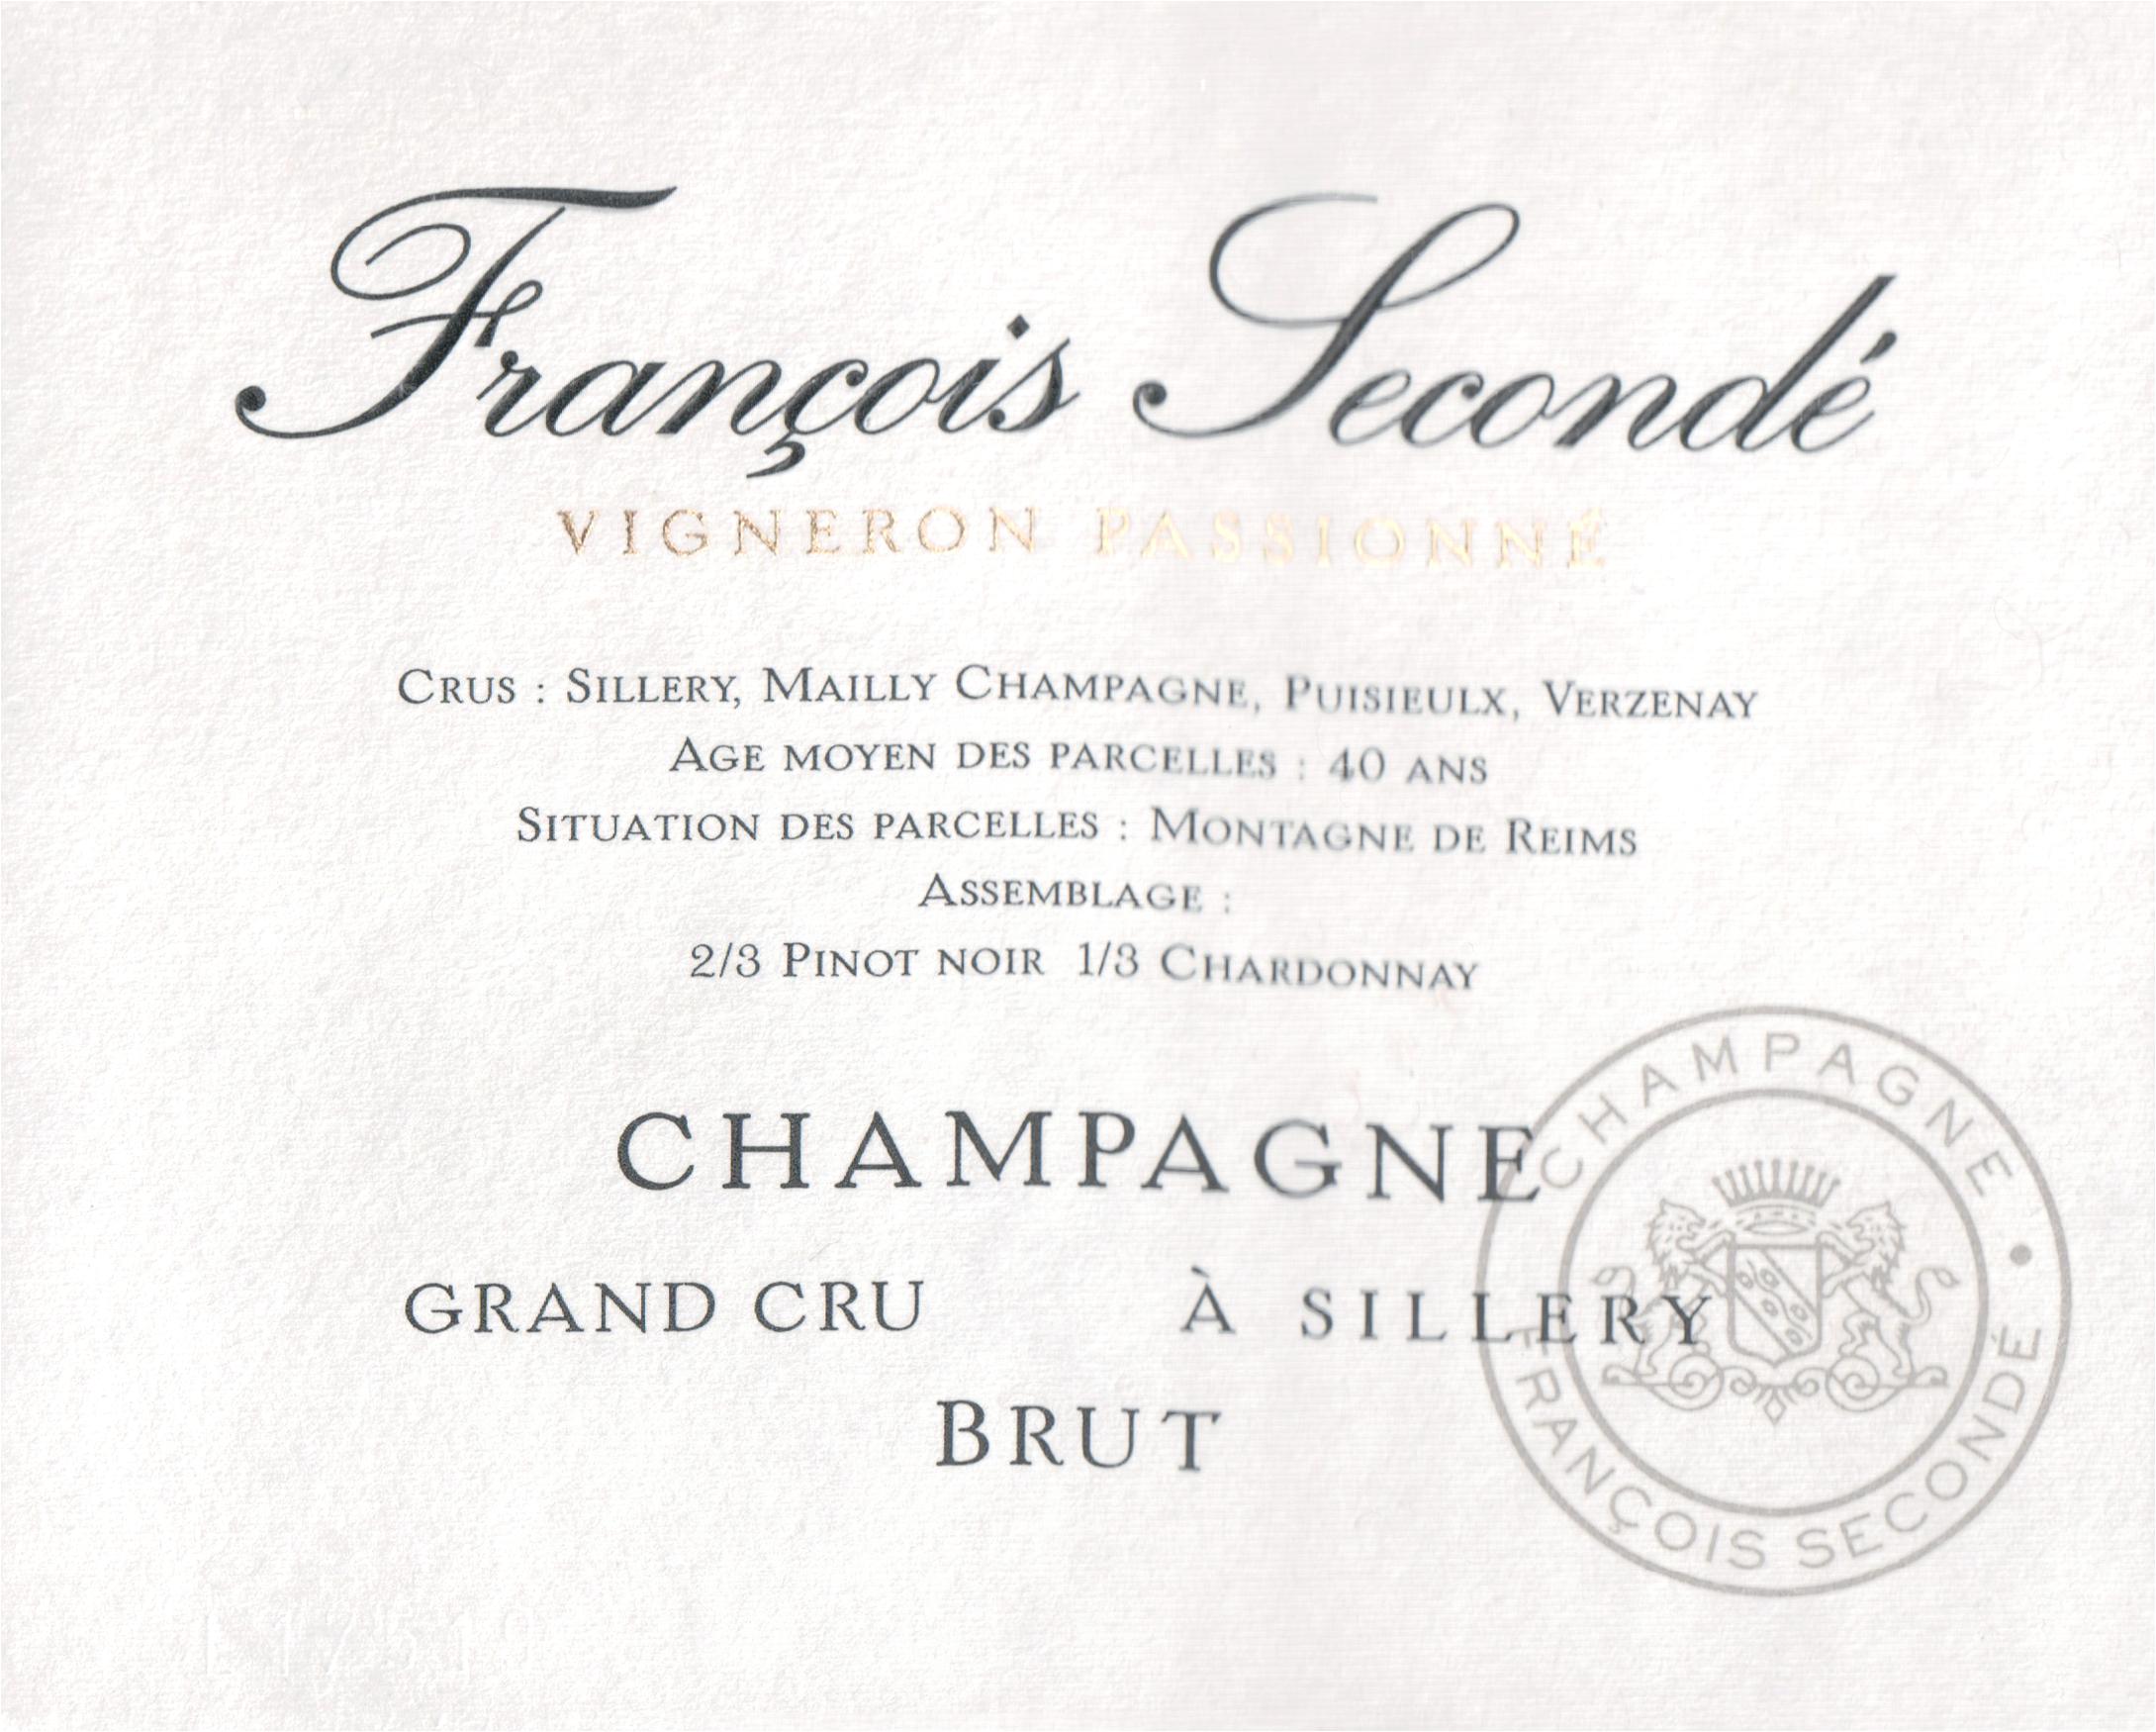 Francois Seconde Grand Cru Champagne